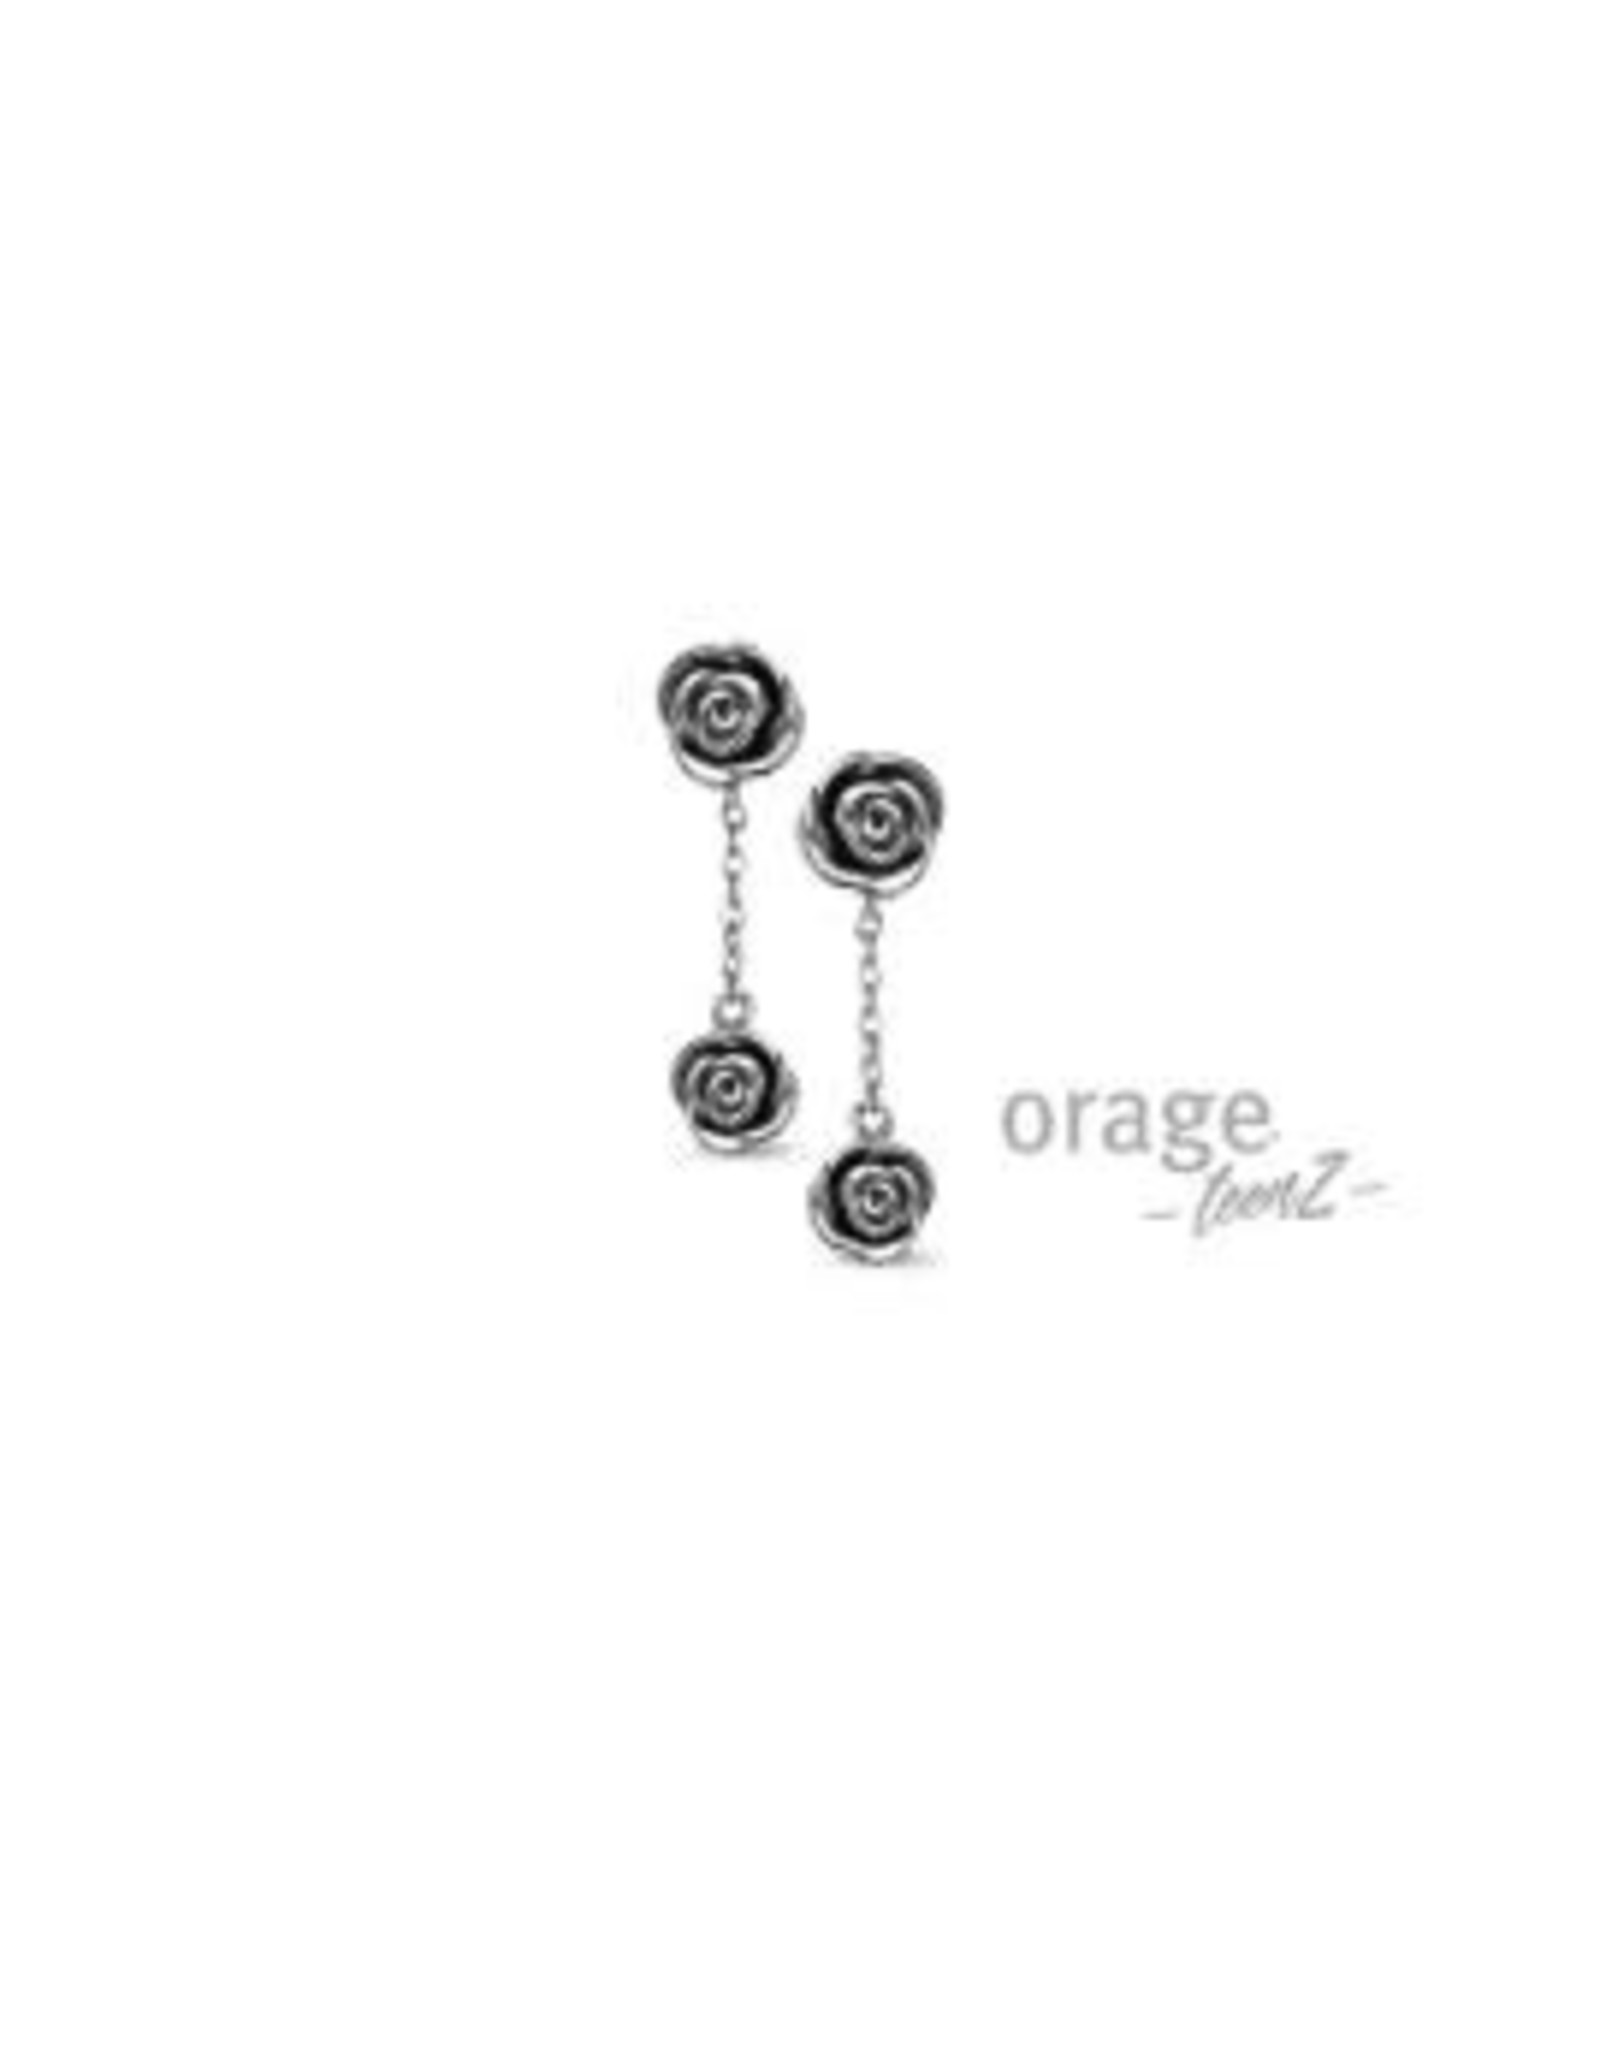 Orage Teenz Oorbellen/Oorslingers Orage Teenz Zilver Roos T160